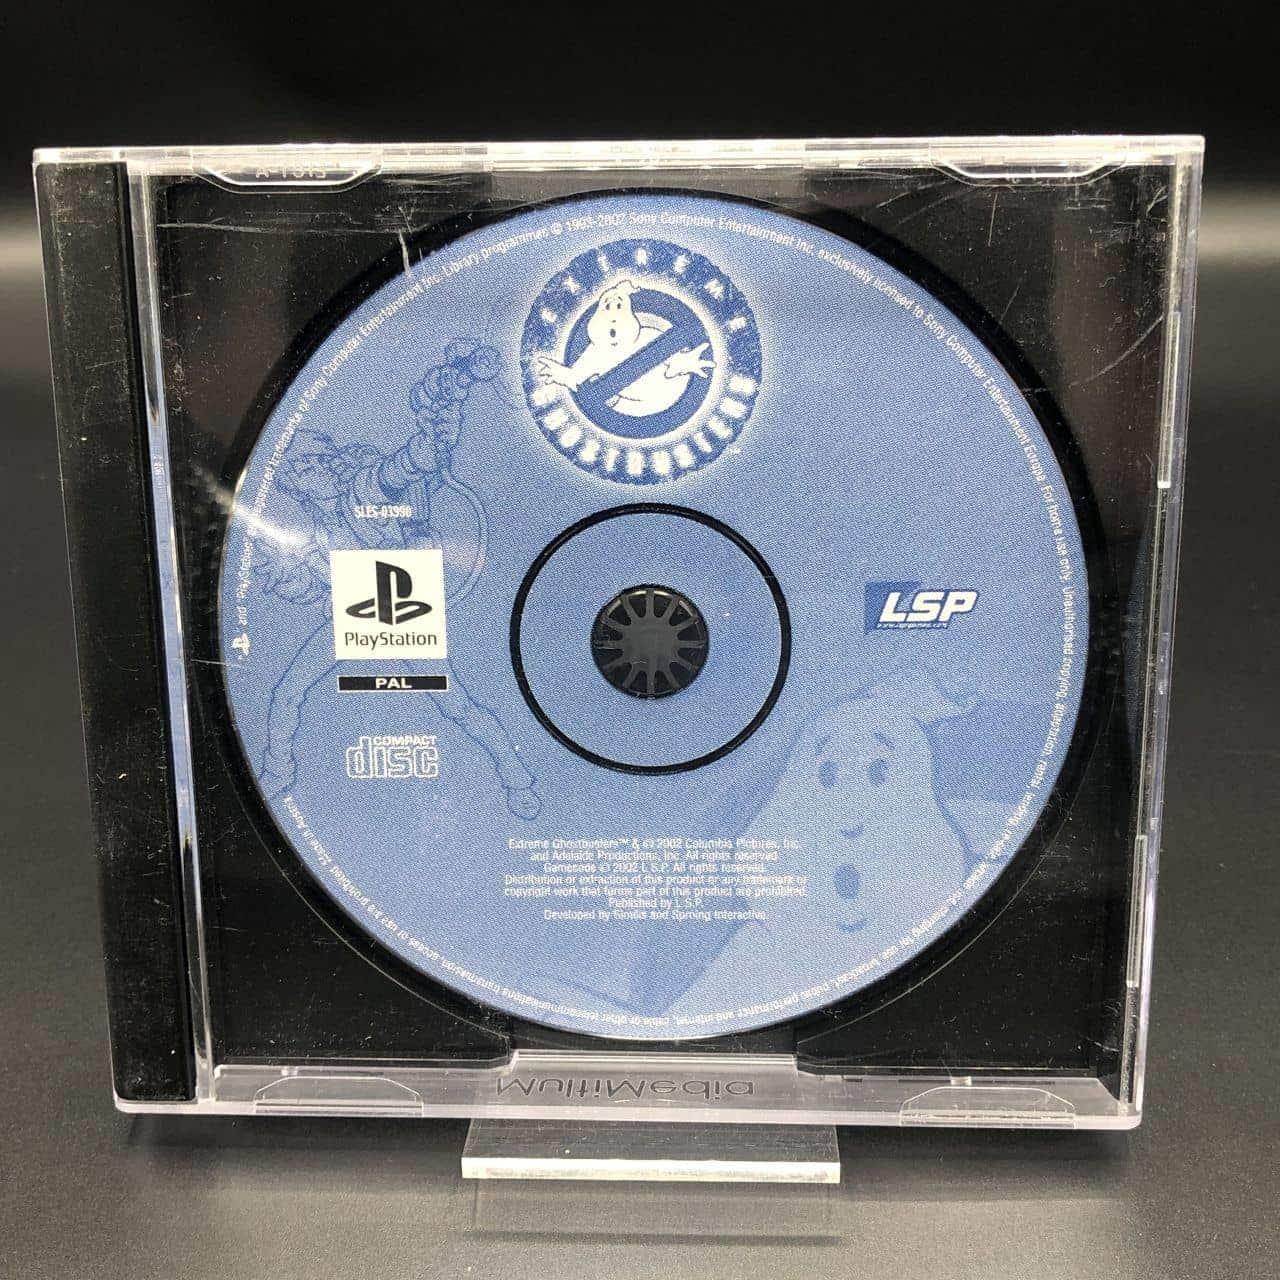 PS1 Extreme Ghostbusters: Ultimate Invasion (nur CD) (Gebrauchsspuren) Sony PlayStation 1